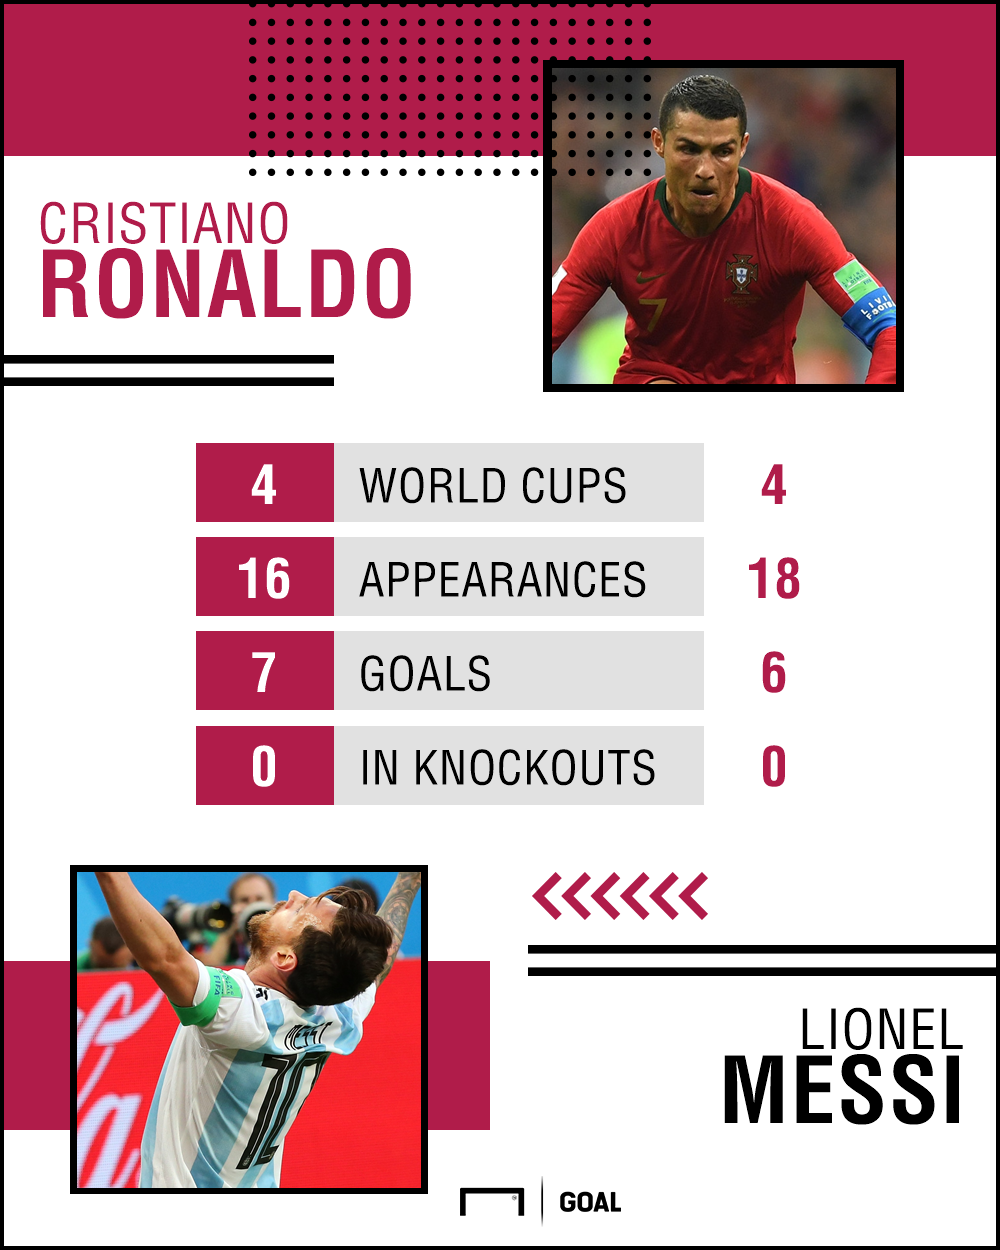 Ronaldo Messi World Cup goals